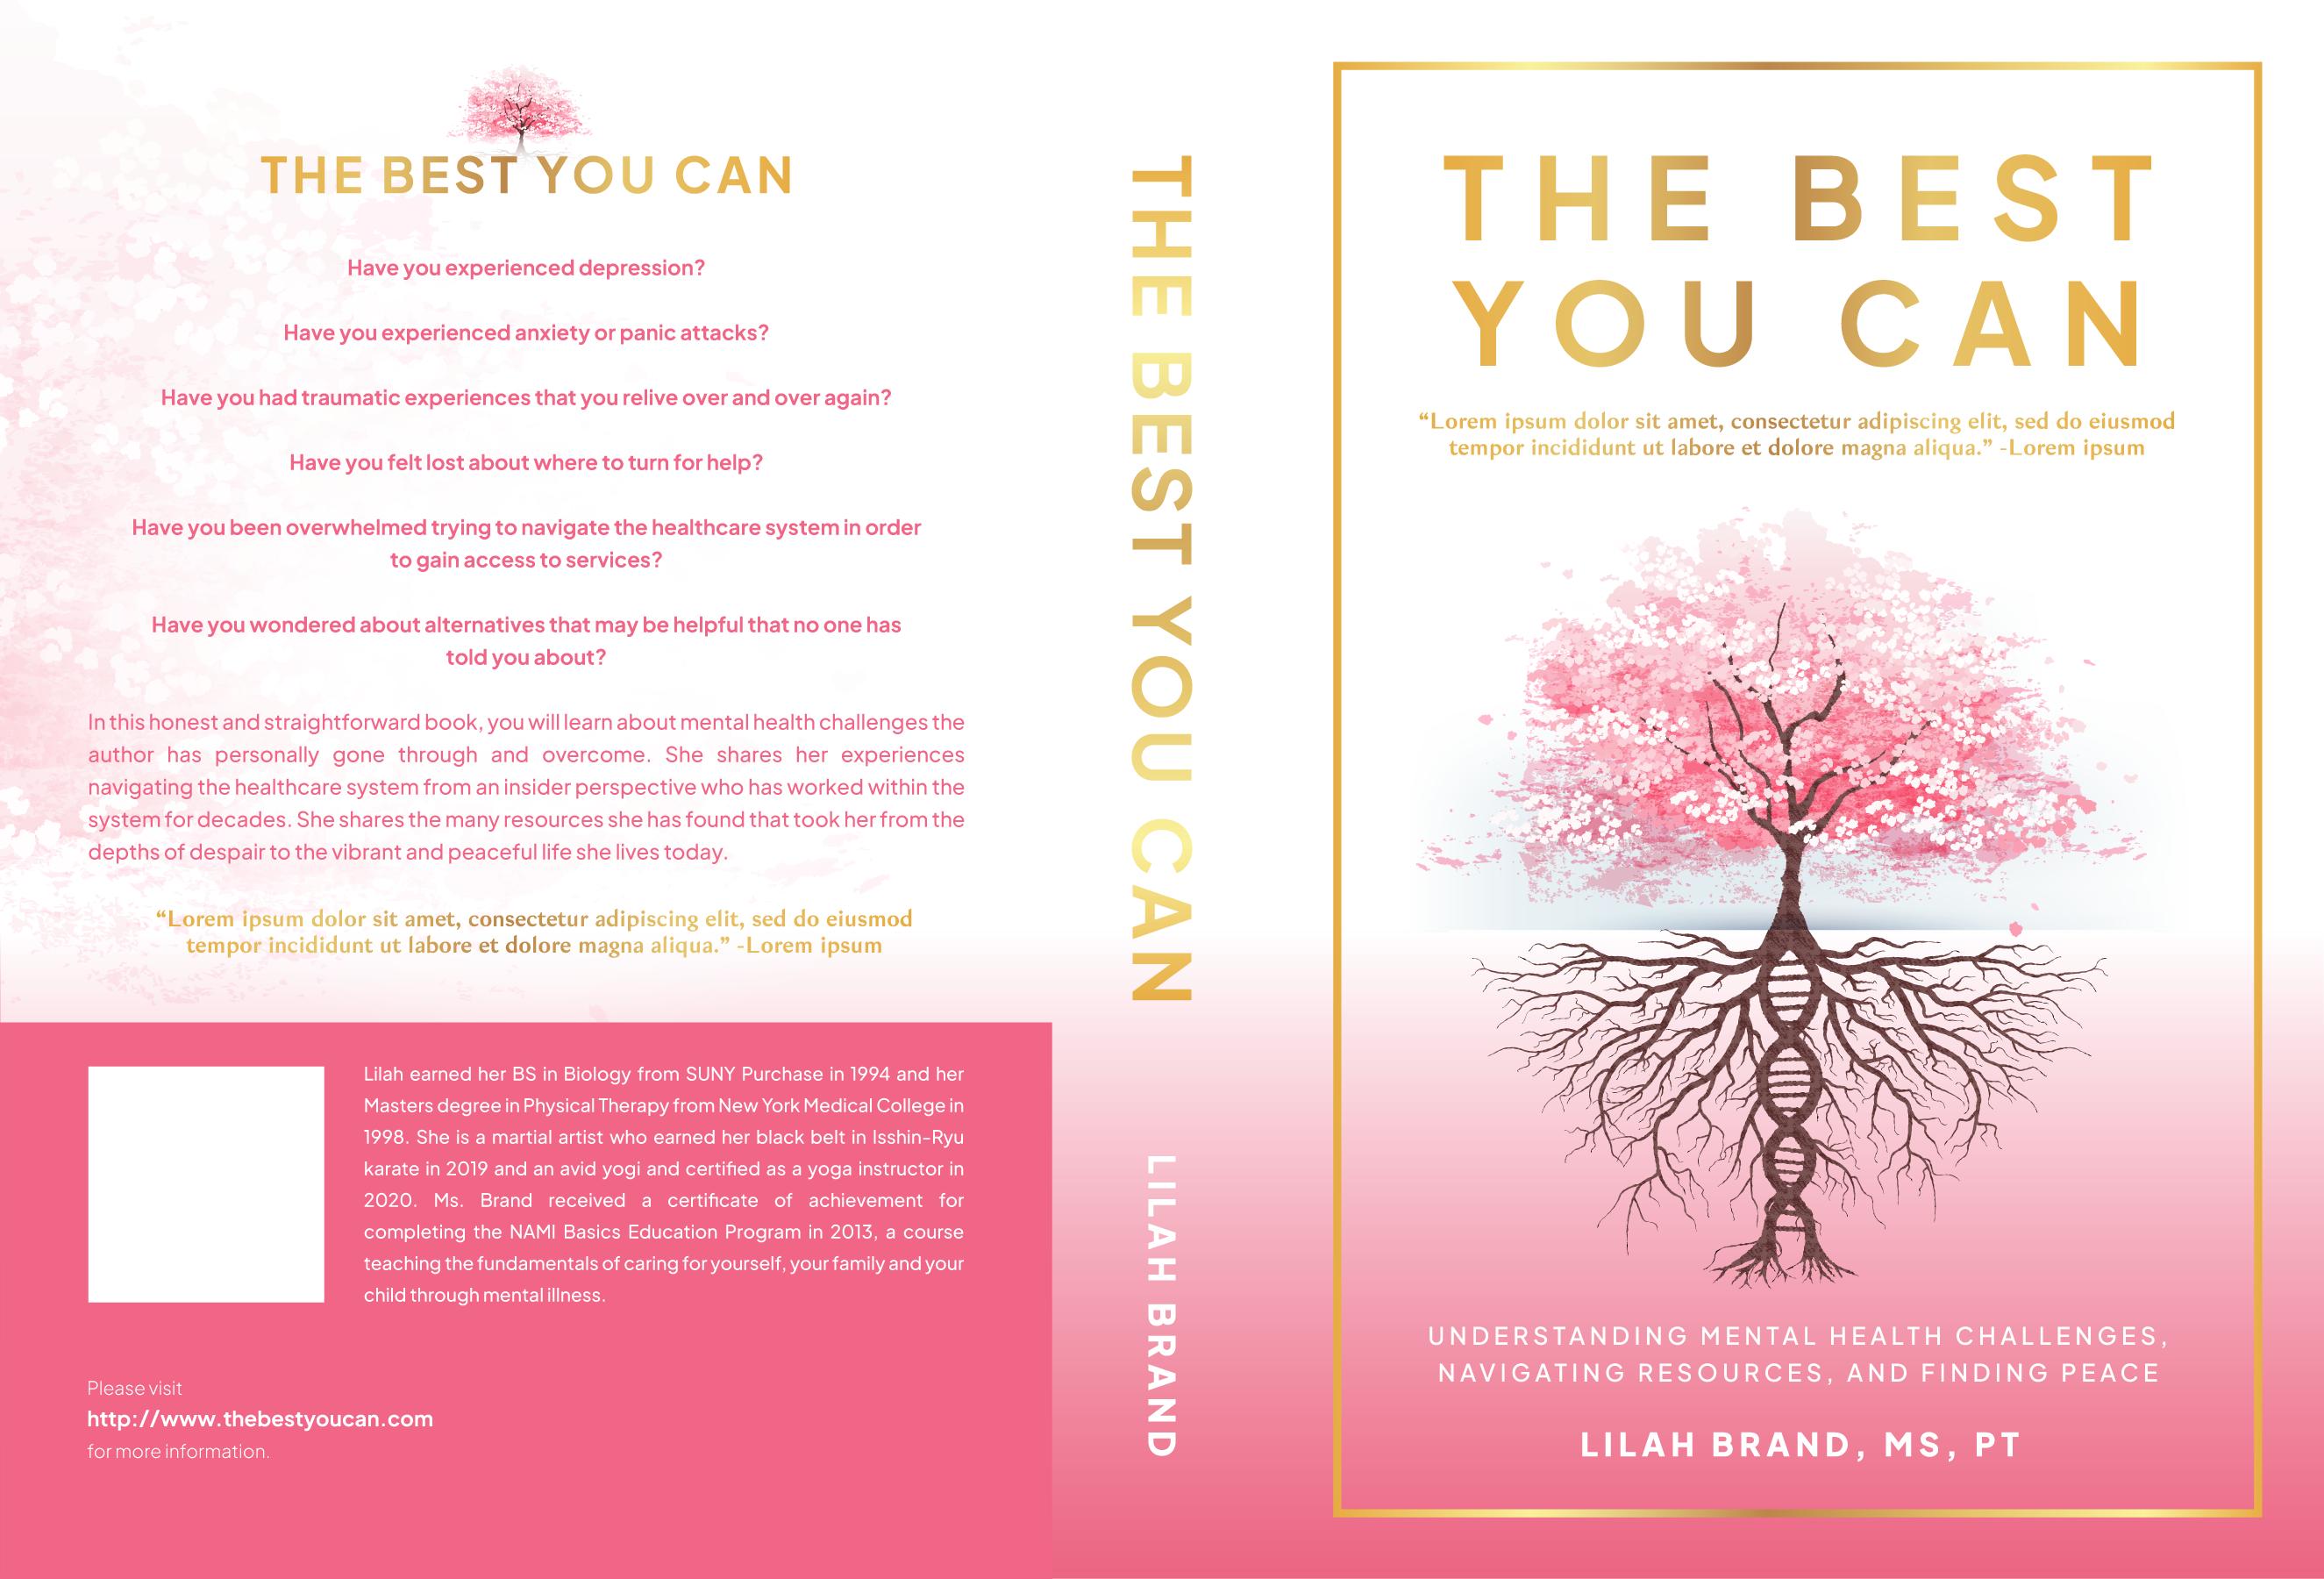 Book cover design to help combat mental illness